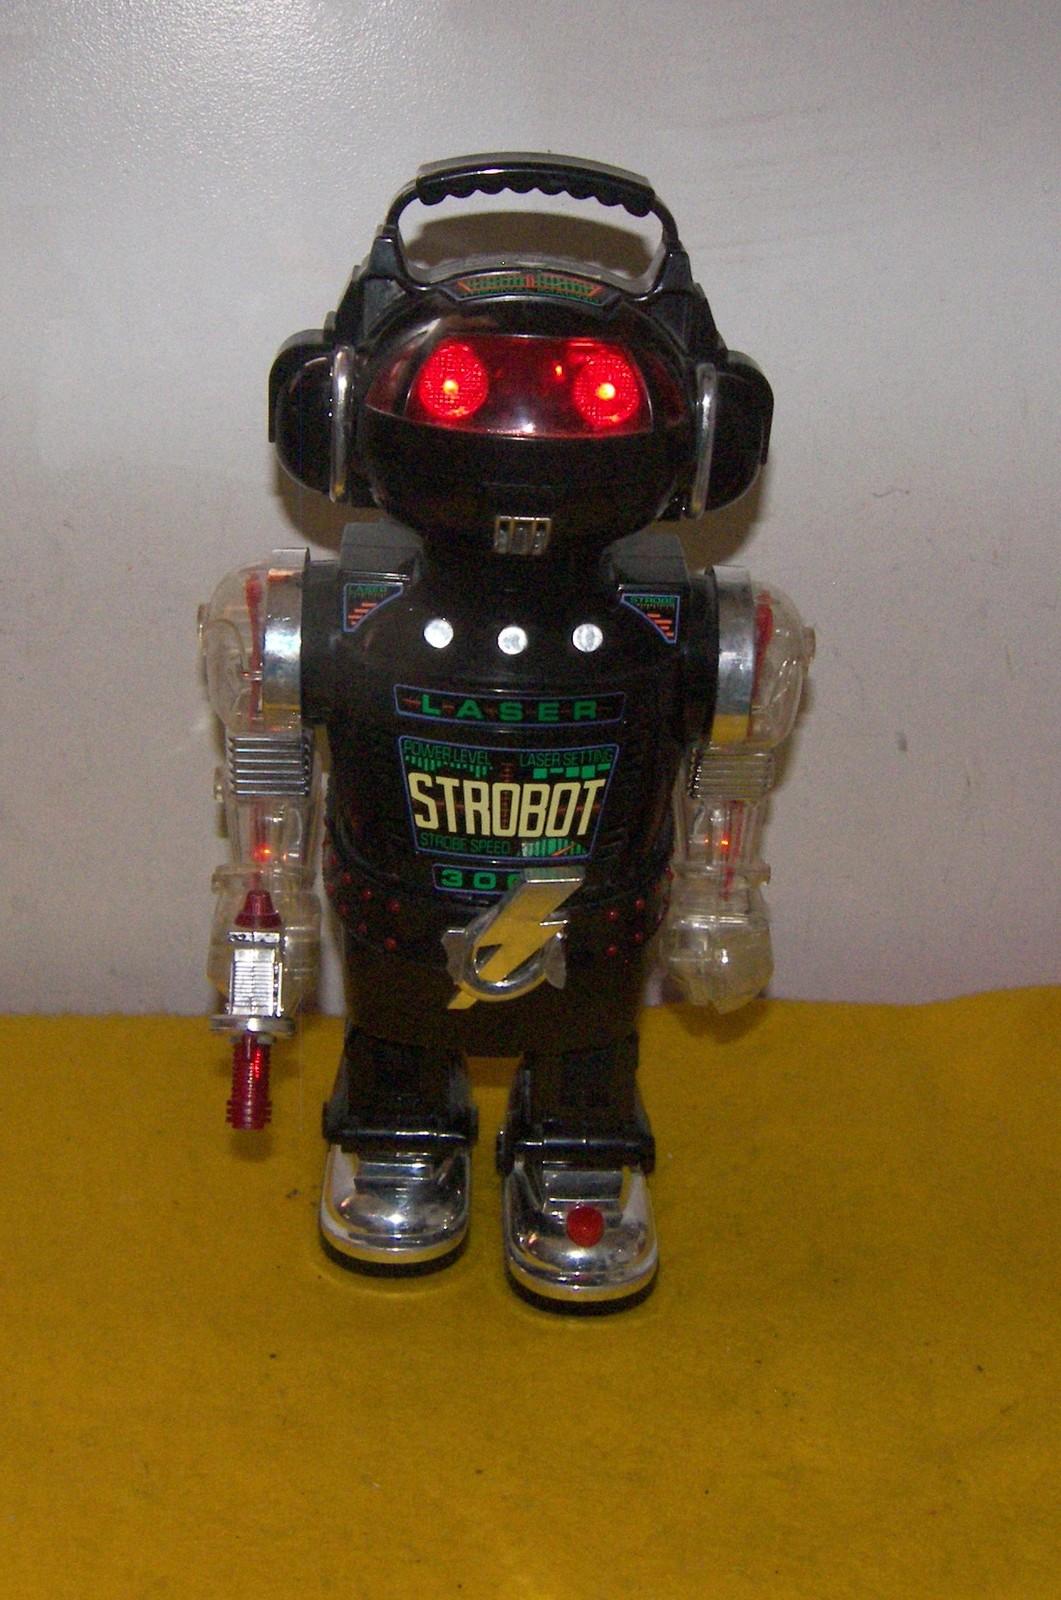 Vintage Strobot Robot Walking / Smoking / Lights / Lacer Sound